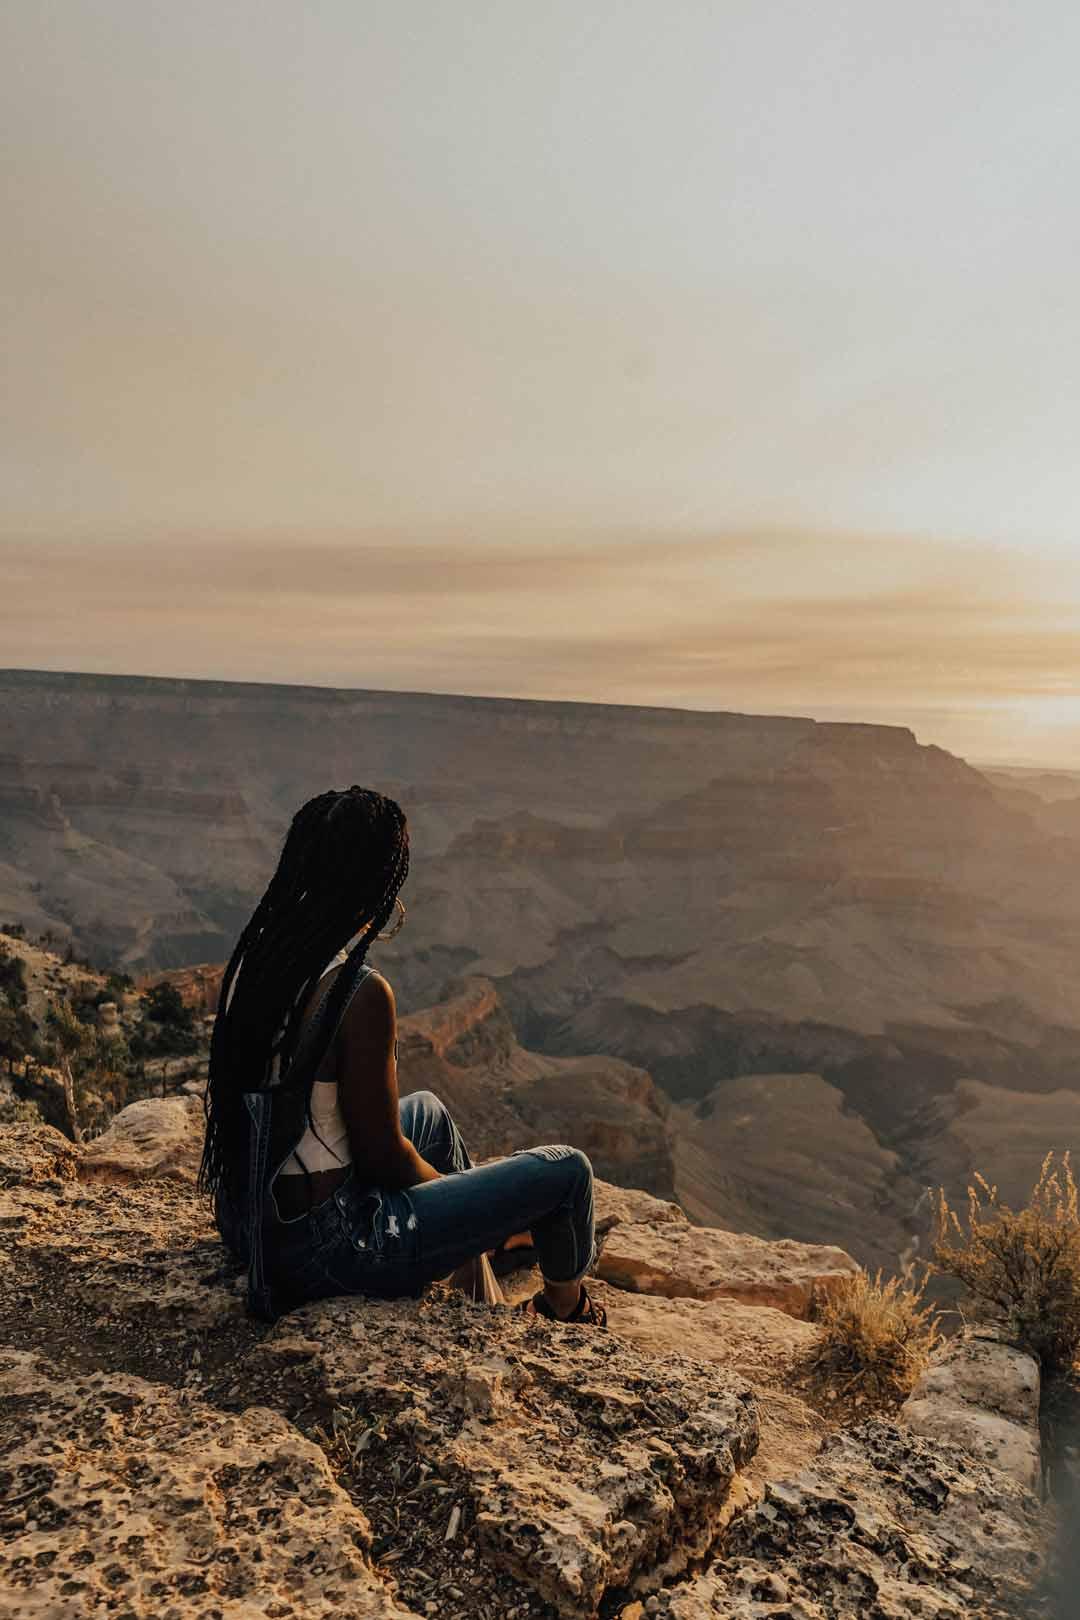 Enocha Tellus at the Grand Canyon